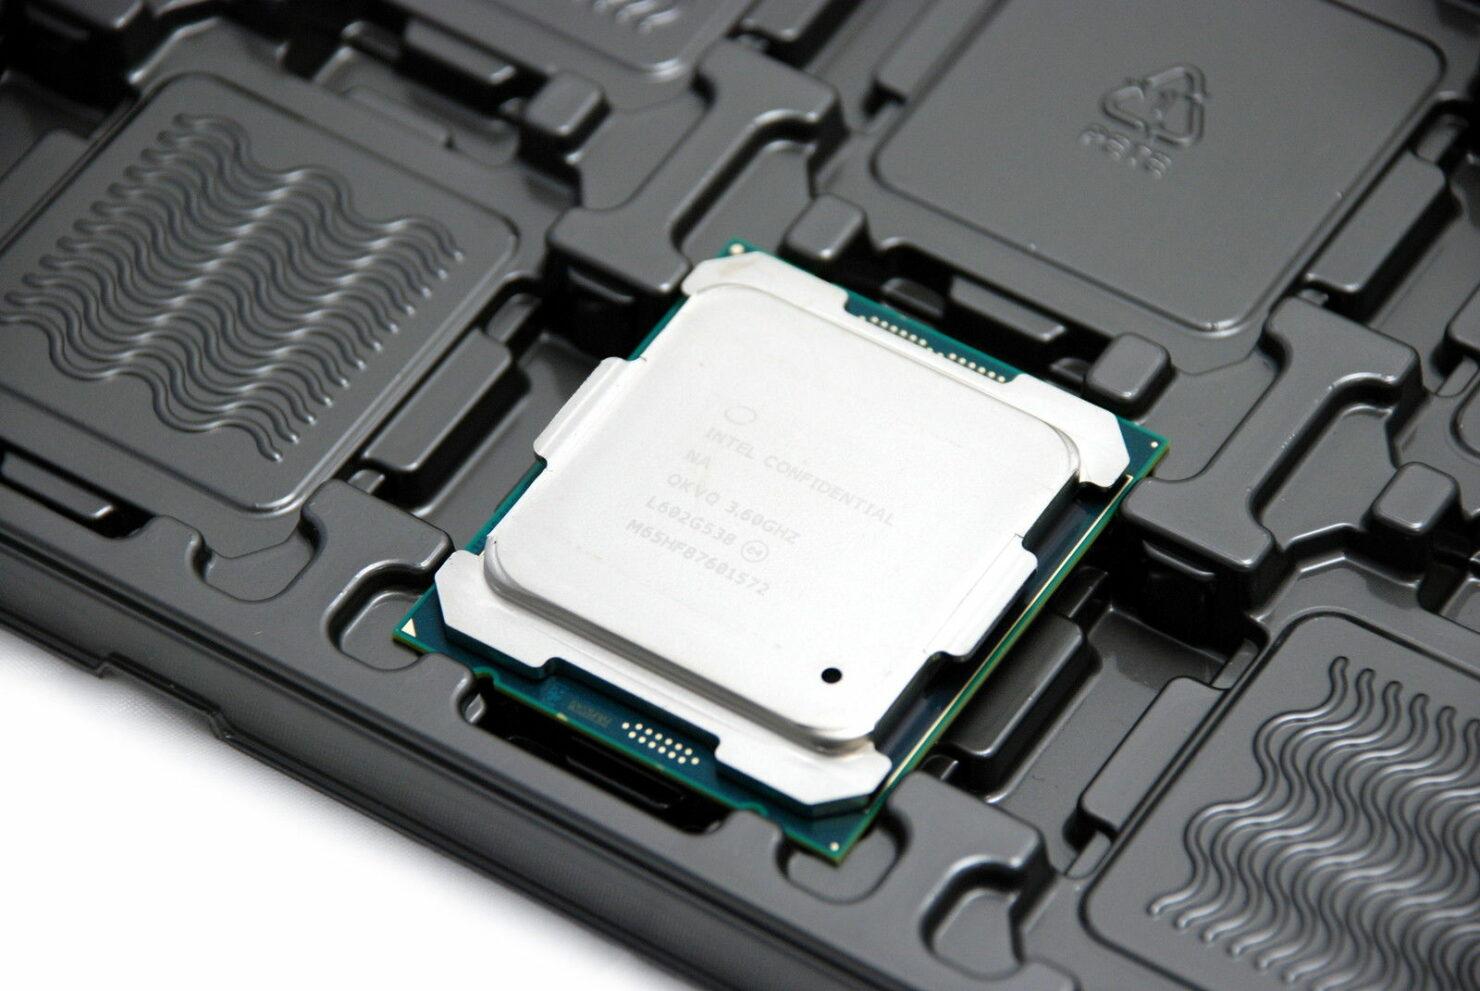 intel-core-i7-6850k_3